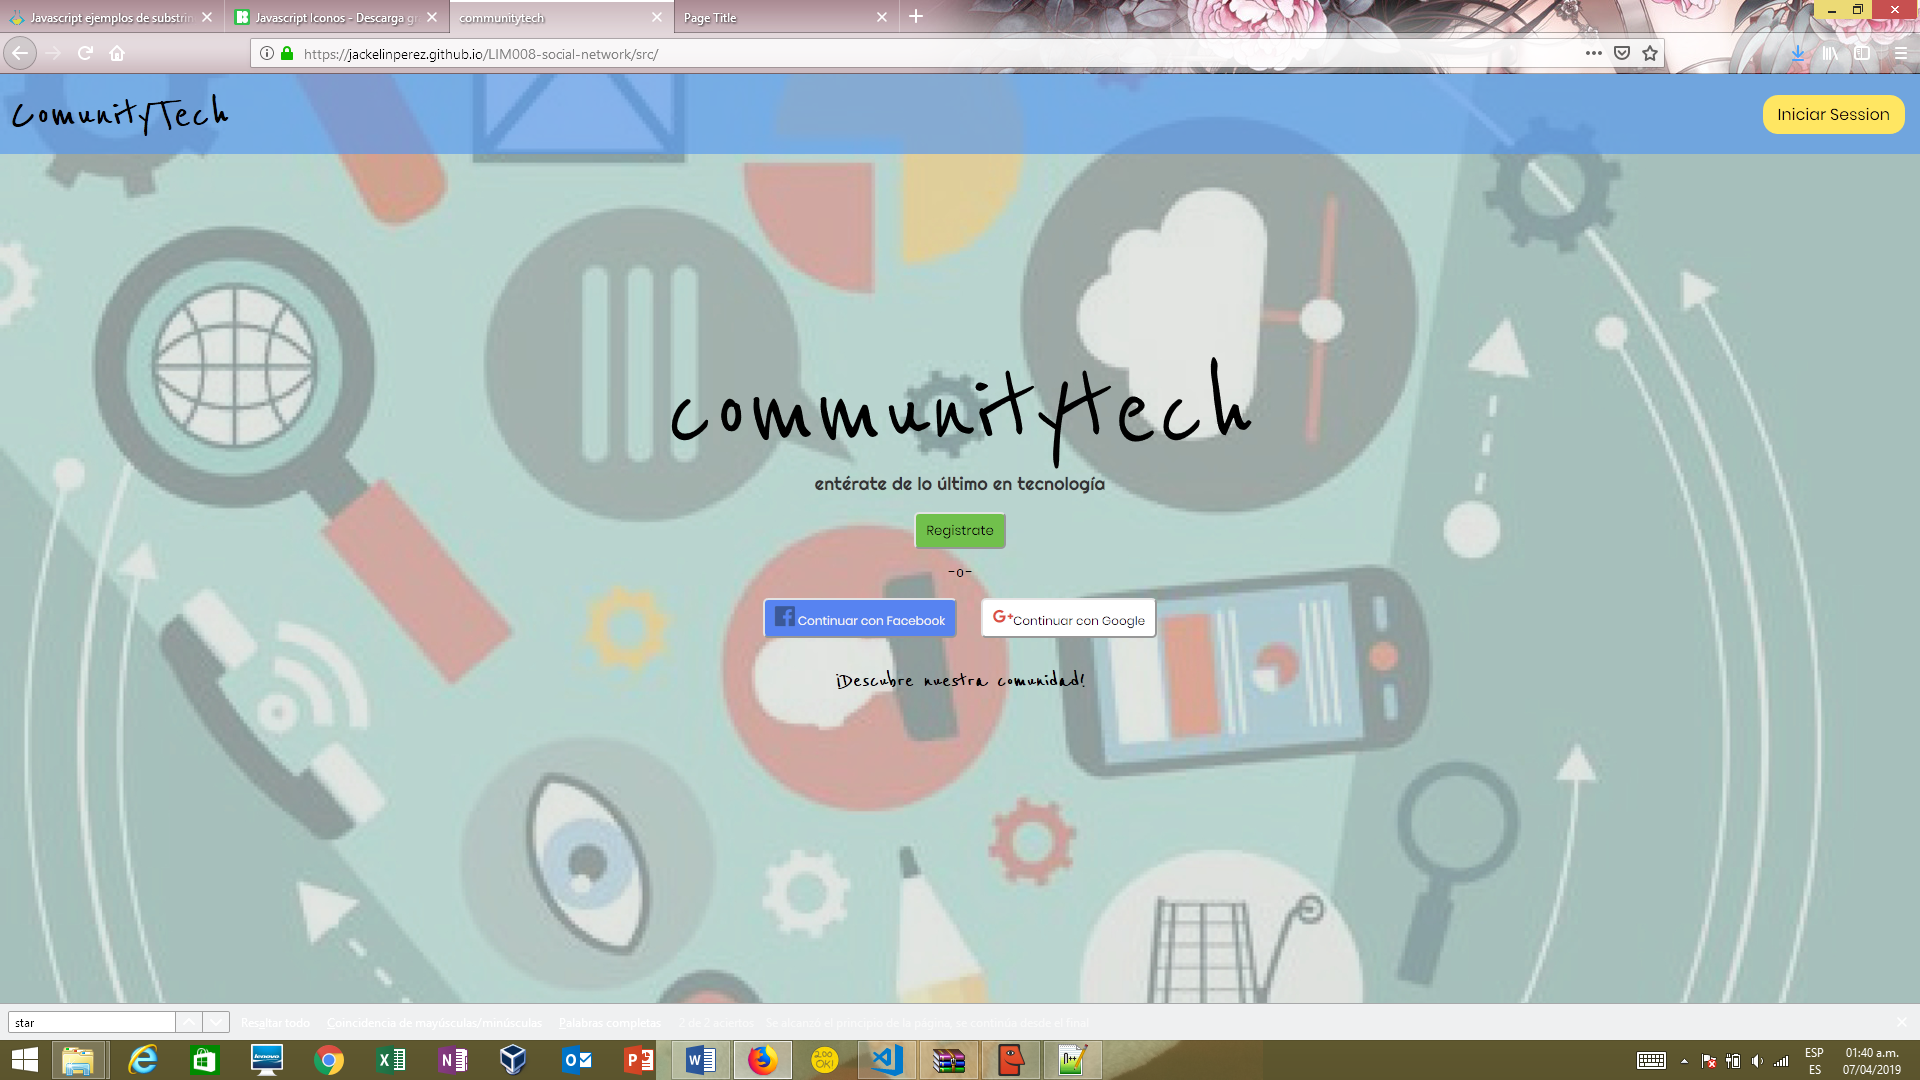 CommunityTech